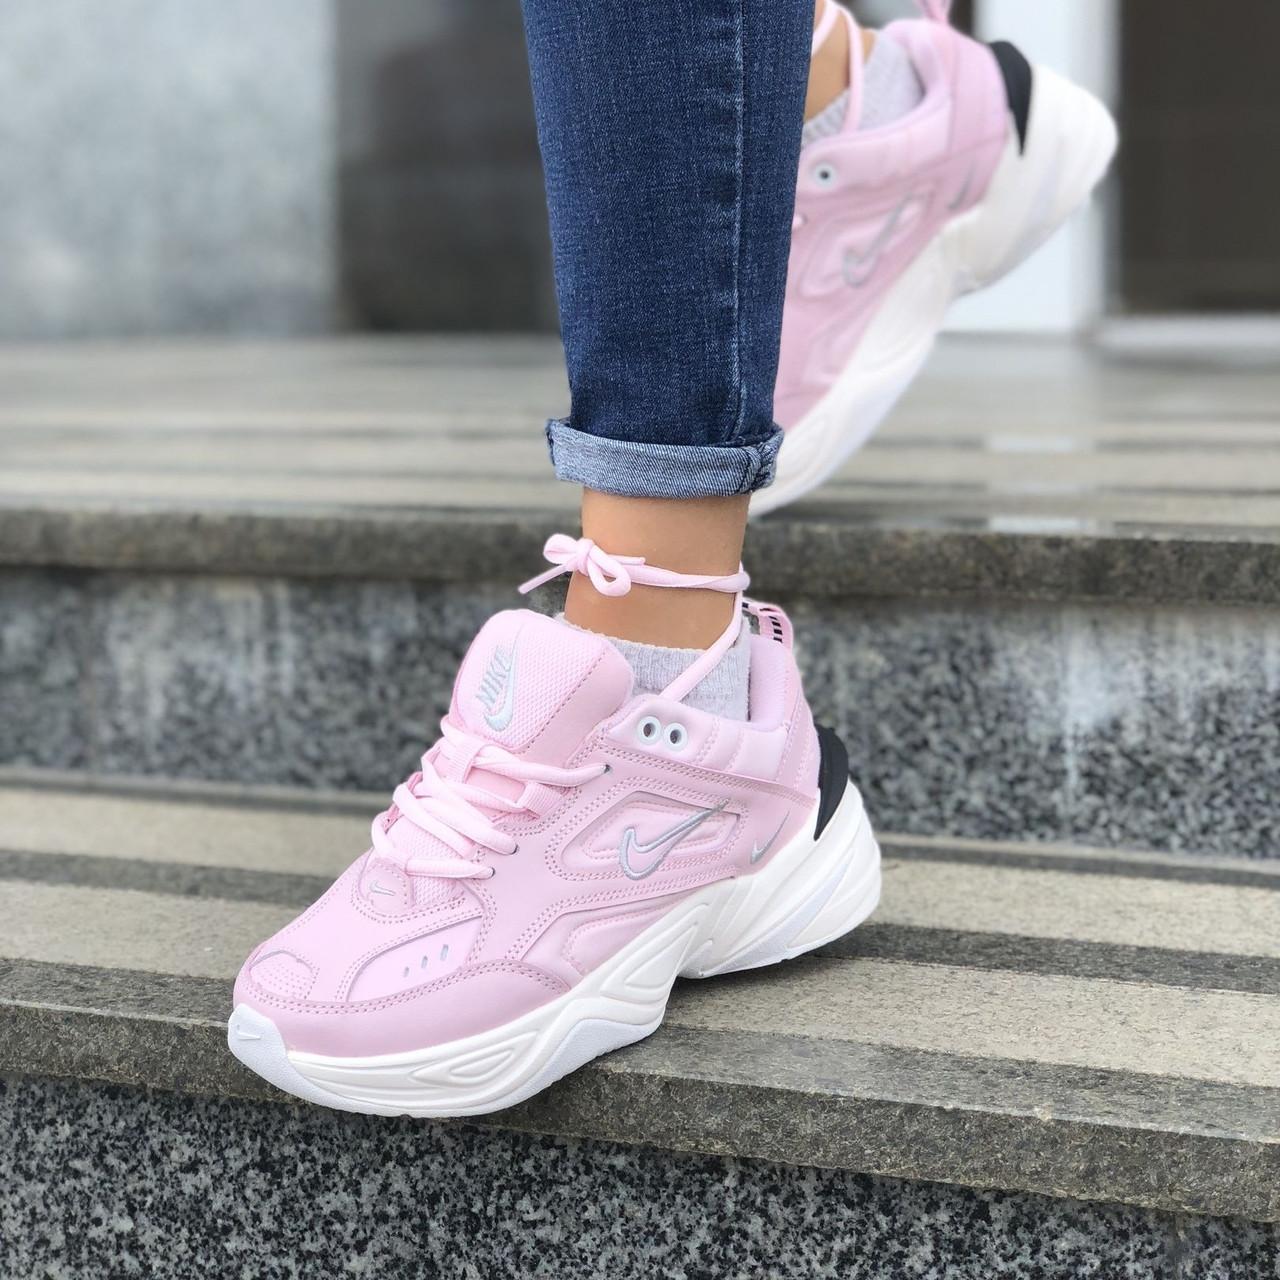 Женские кроссовки в стиле Nike M2k Tekno Pink